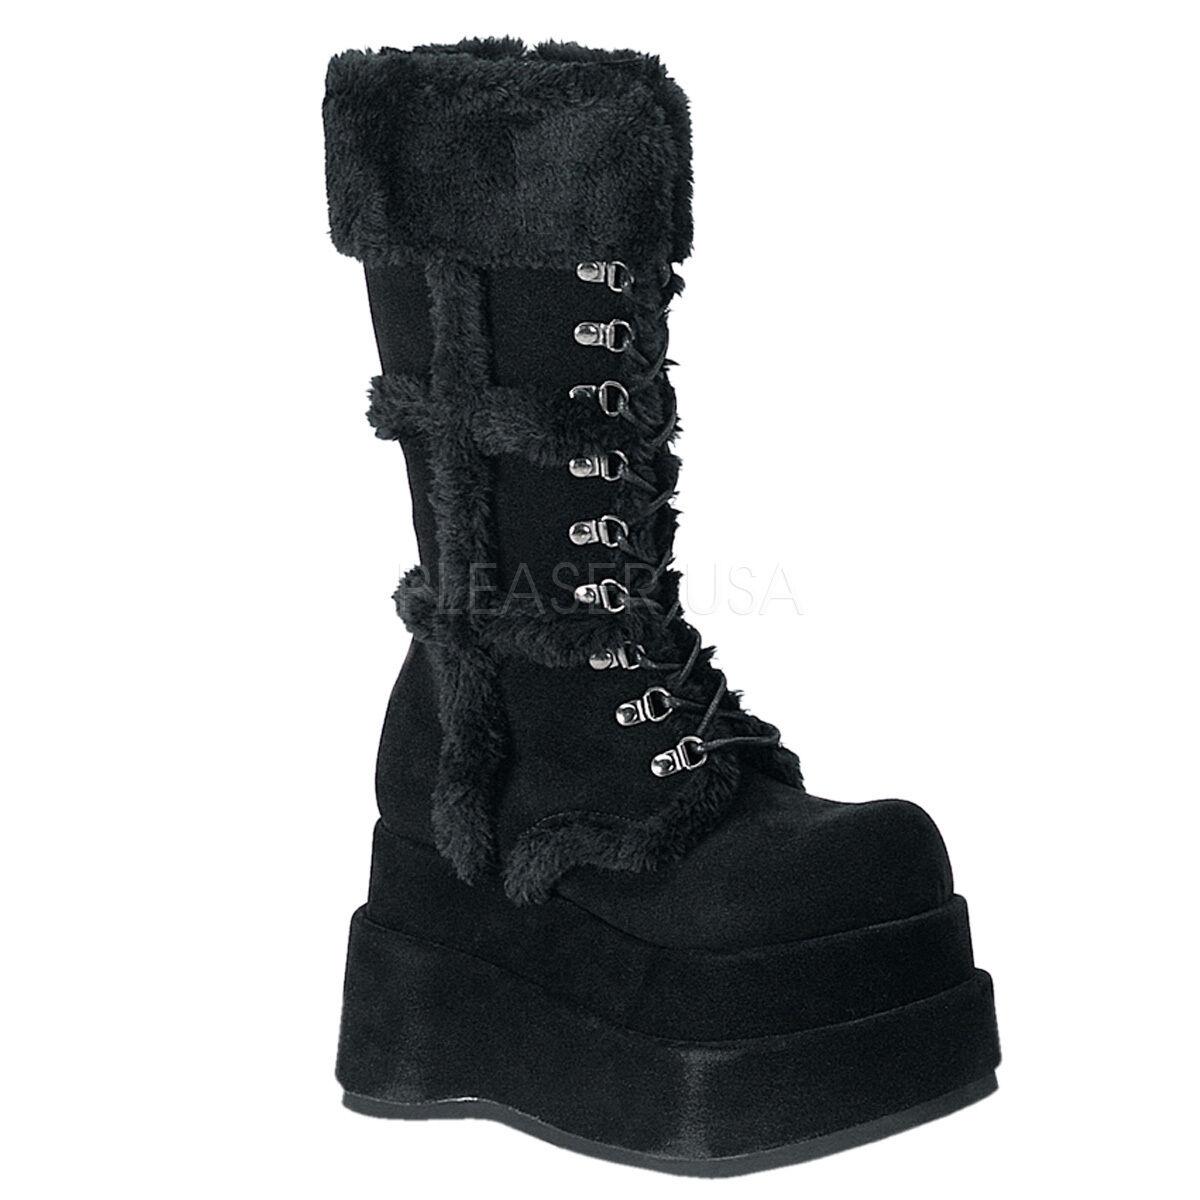 Demonia Oso 202 B PU para Mujer Peludo Fuzzy Fuzzy Peludo Negro Plataforma botas Becerro Gogo bailarín ce8cd6